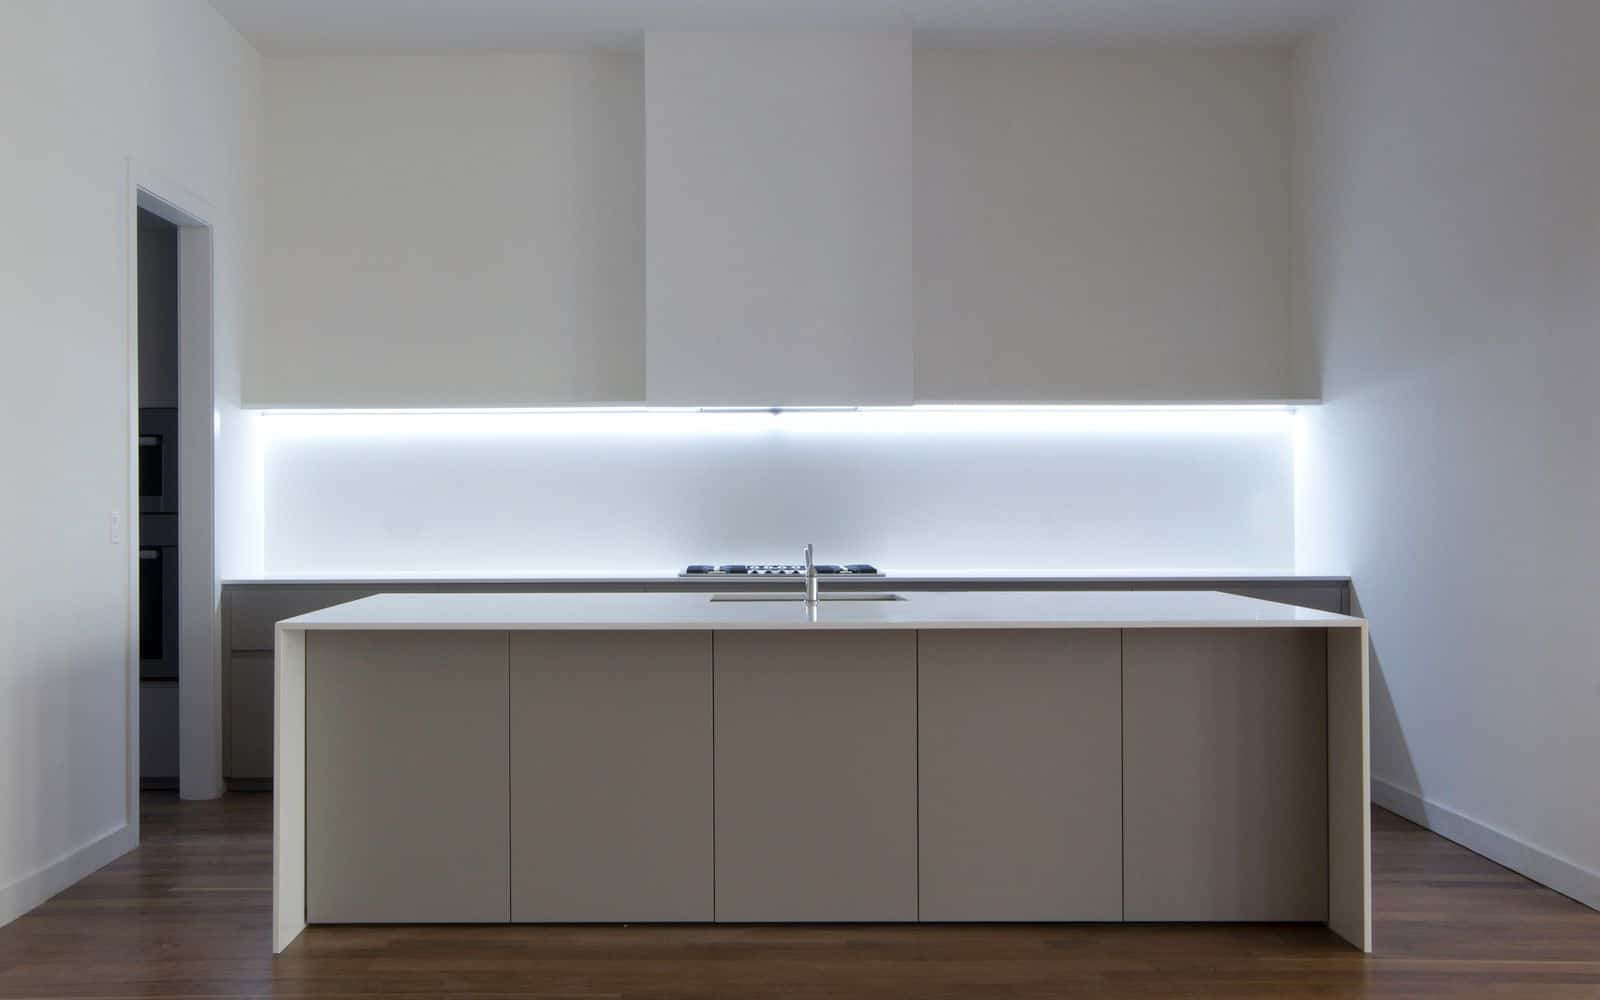 Minimalistic Modular Kitchen Lighting